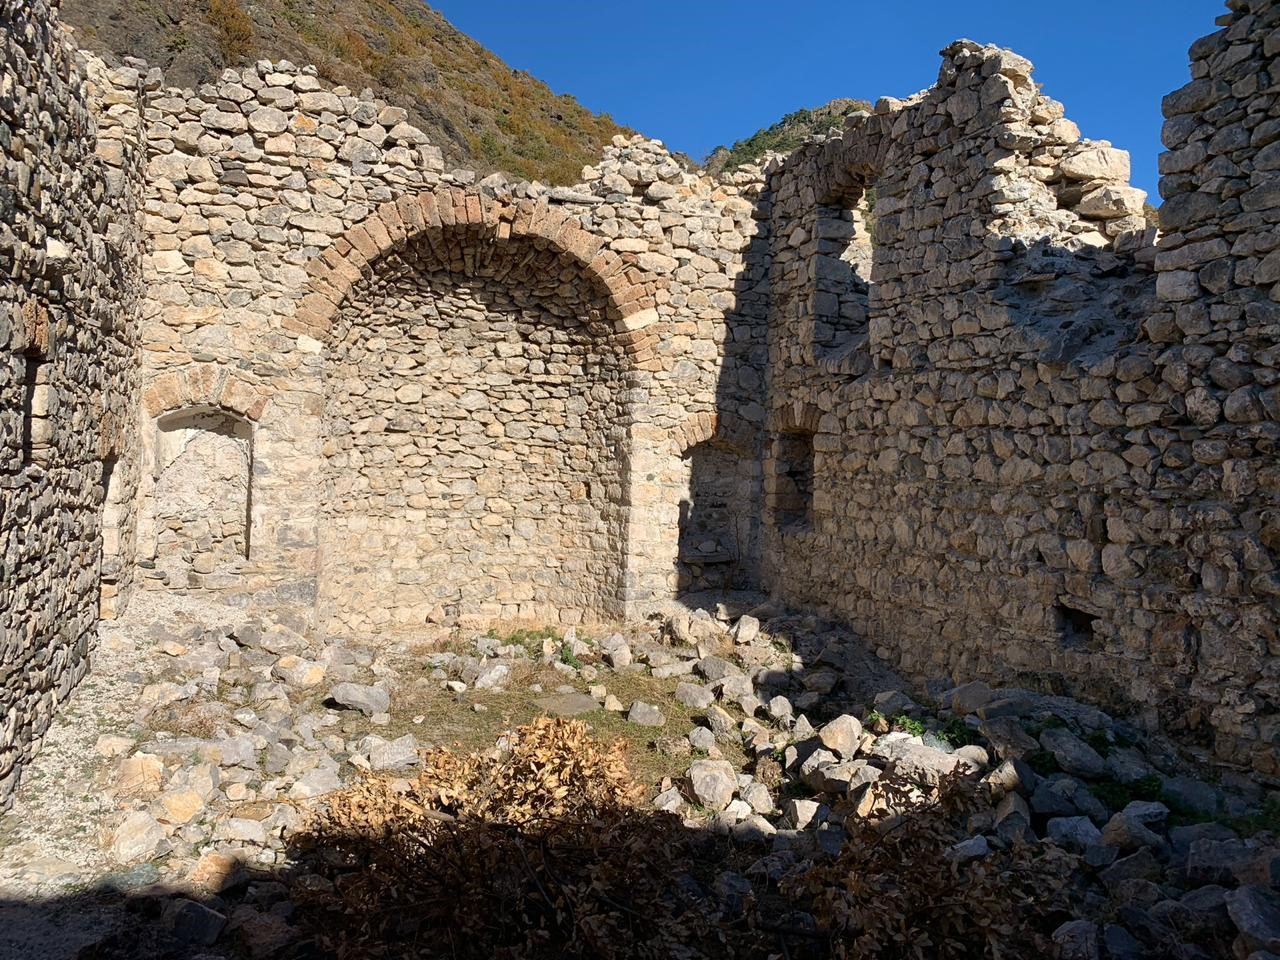 foto 72 Mbeturina te Kishes Orthodokse ne fshatin Punemire–Opar–Korce (foto e Ergi Kames-shtator 2020)